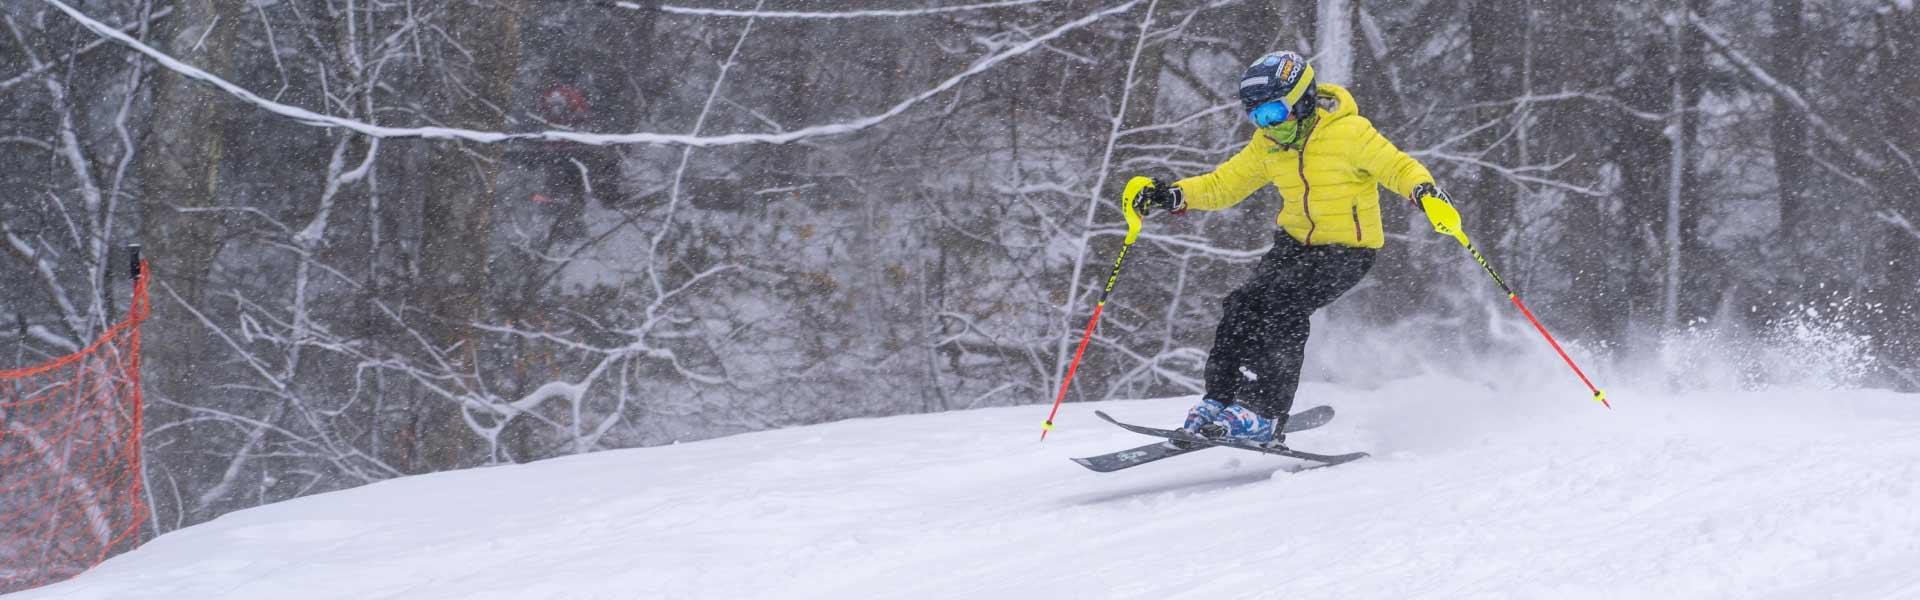 Racer on snowy trail